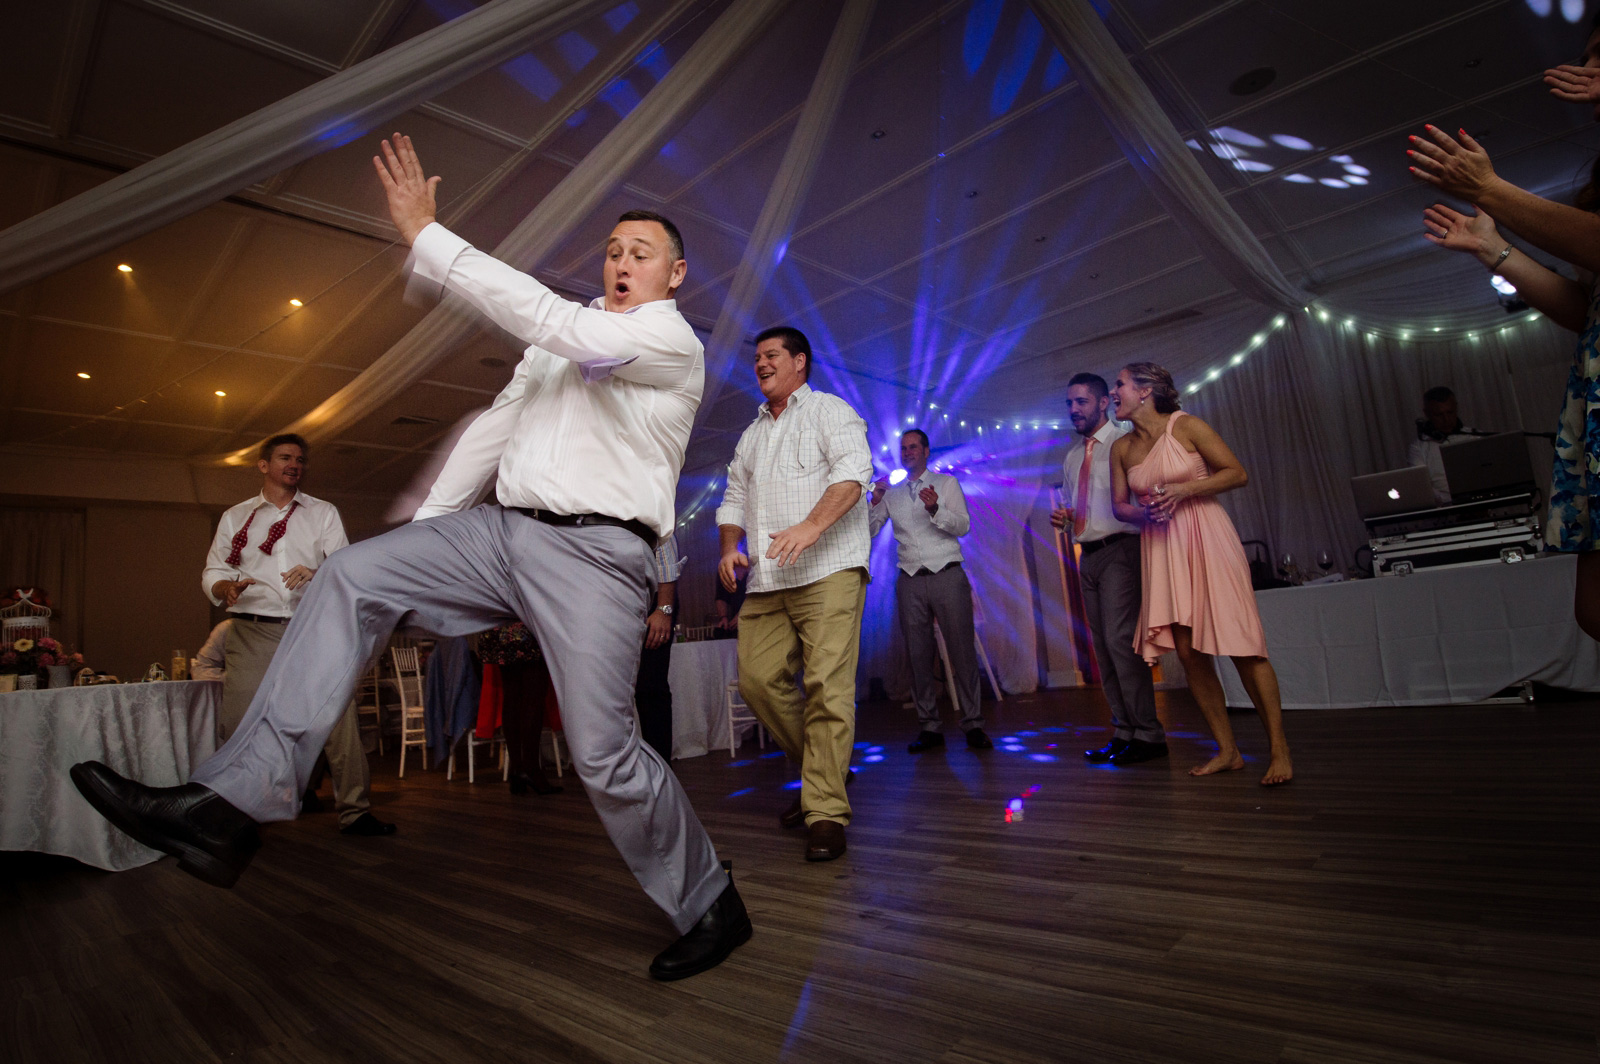 drunk man dancing